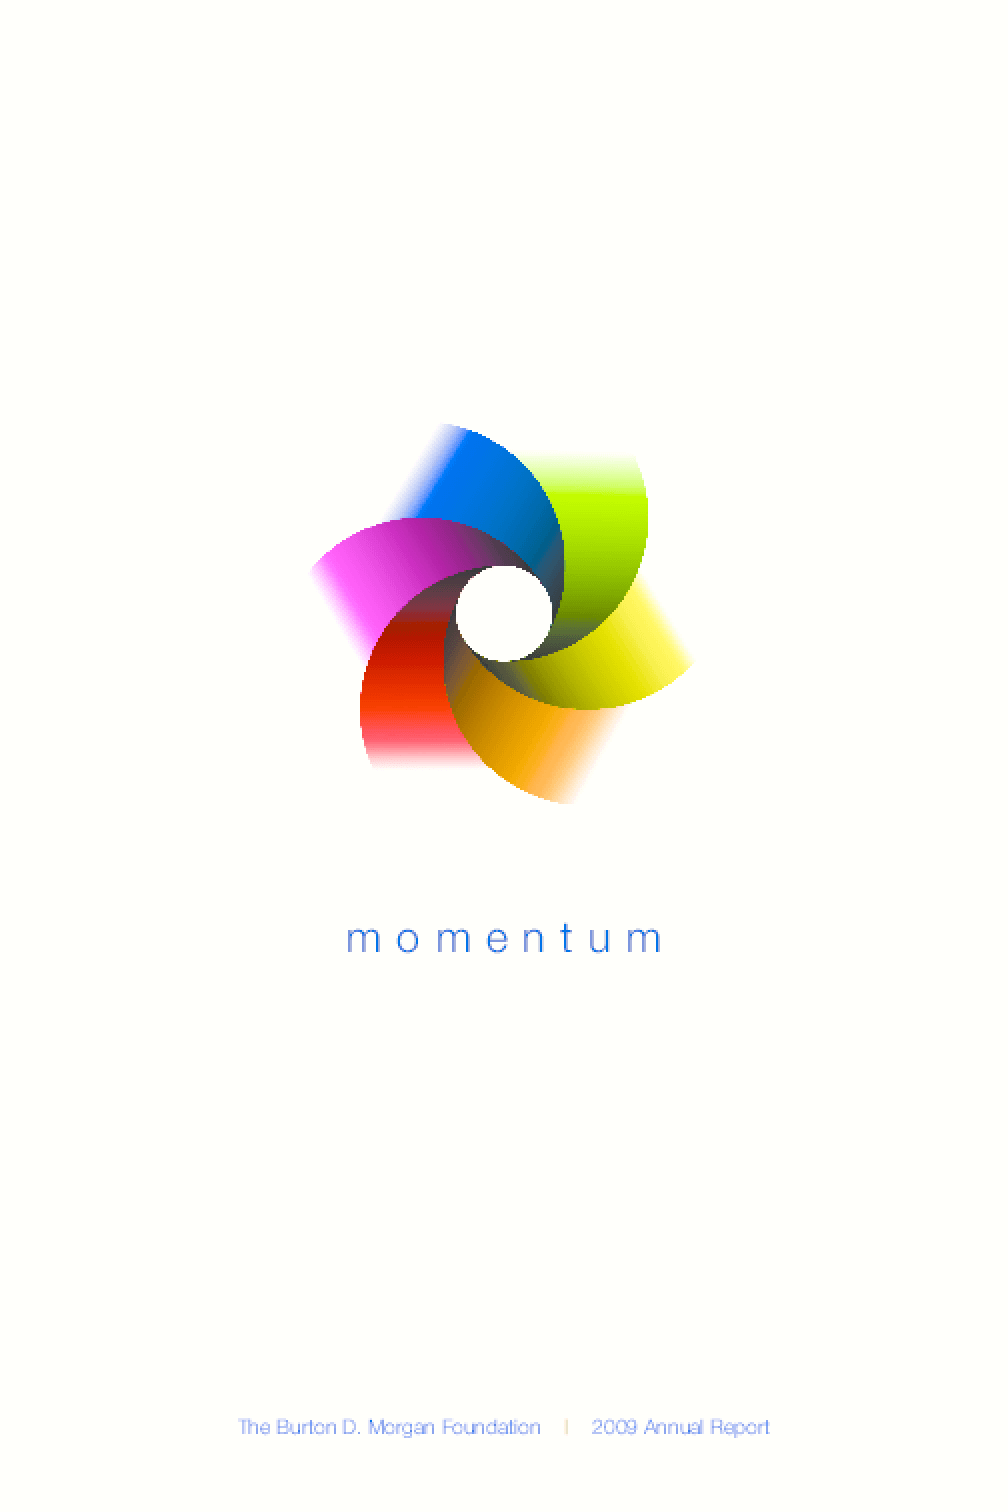 Momentum: The Burton D. Morgan Foundation 2009 Annual Report